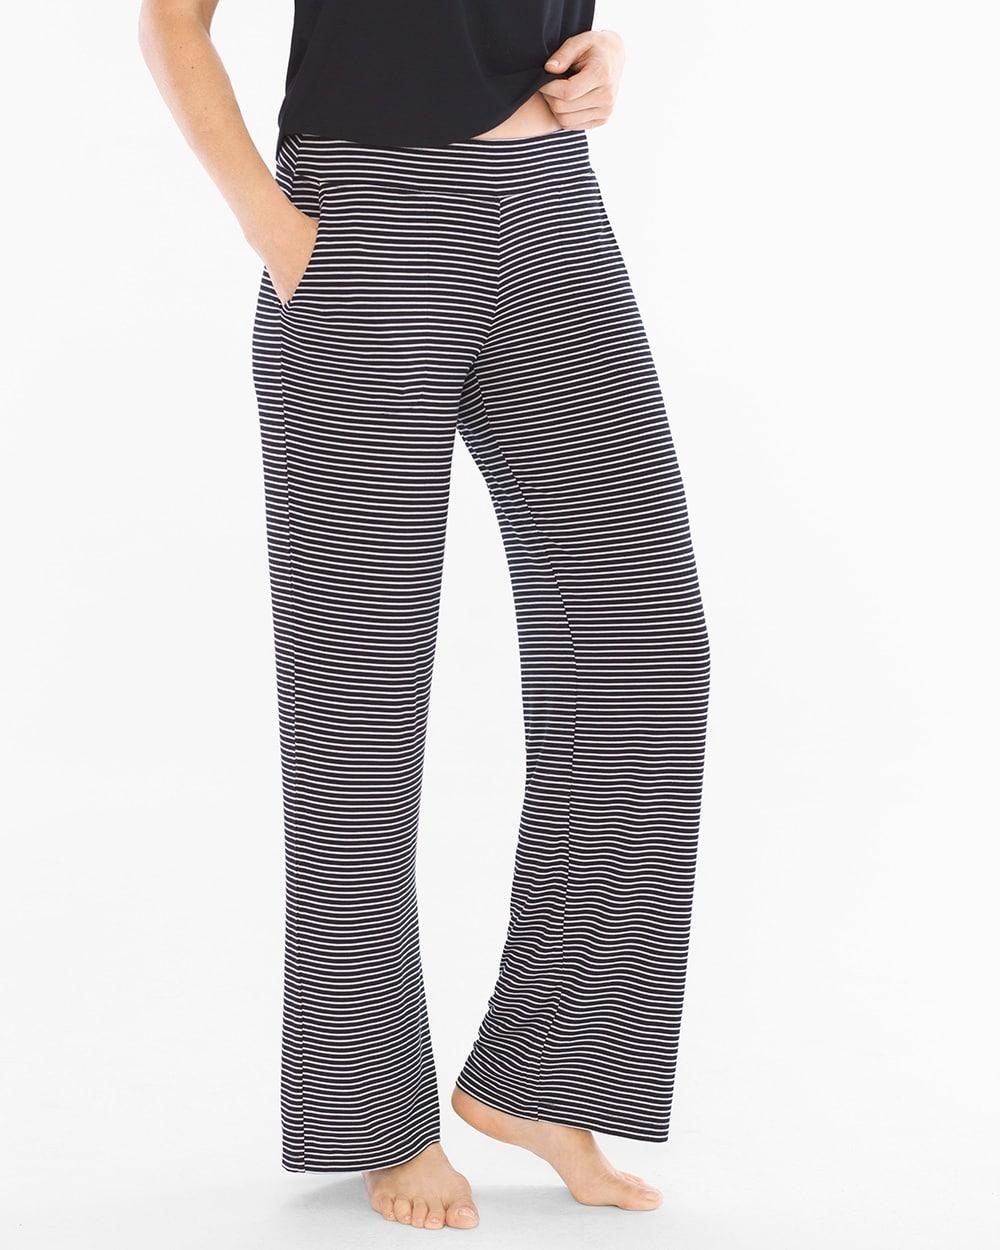 Cool Nights Pajama Pants Infinite Stripe Black - Soma 9c5493507